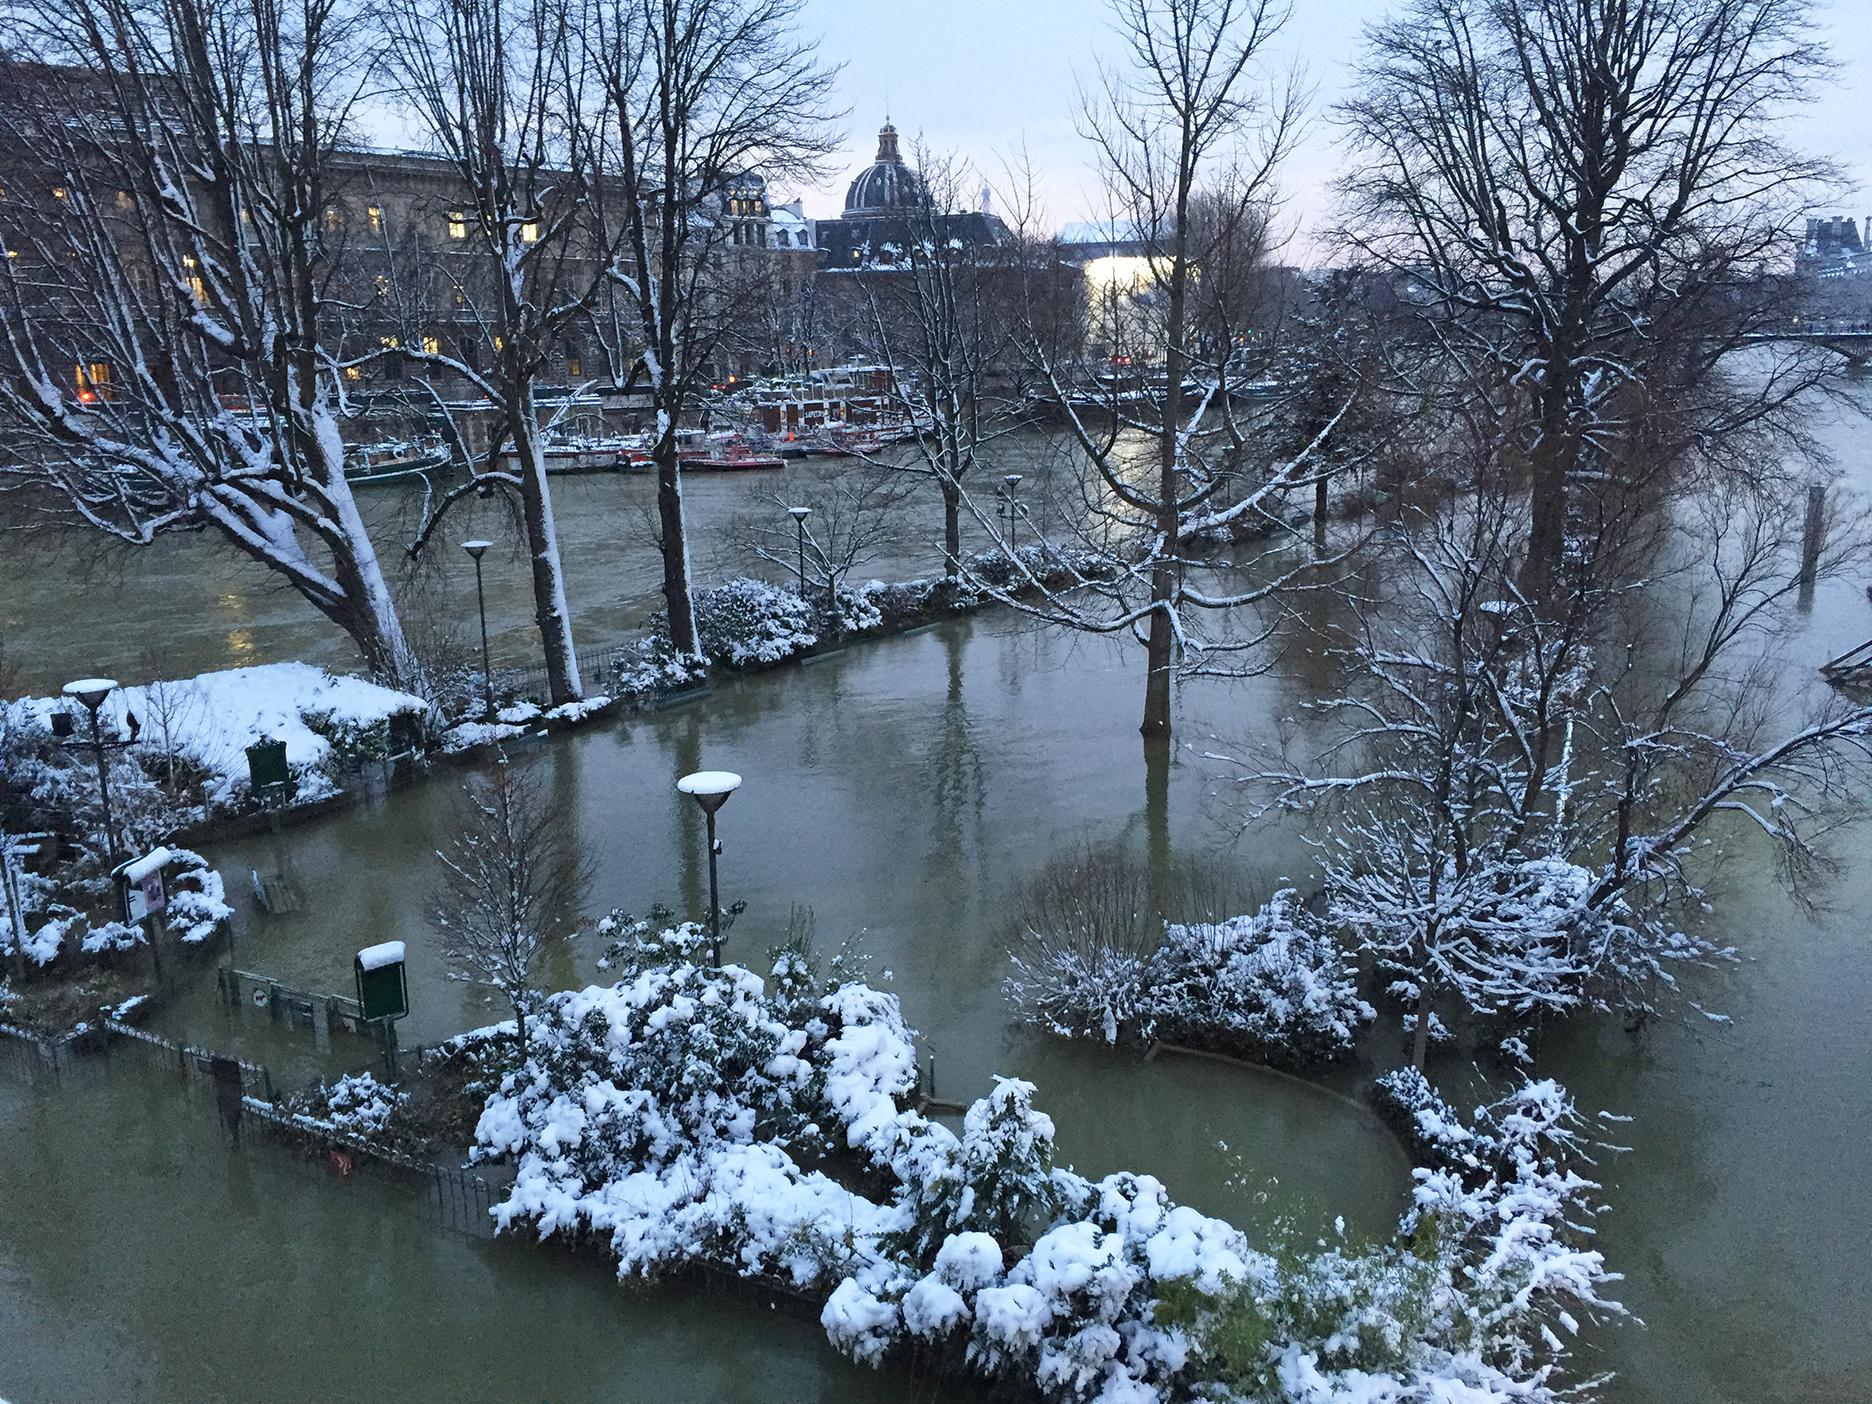 Snow-covered vegetation outlines the triangular tip of a still flooded Square du Vert-Galant.